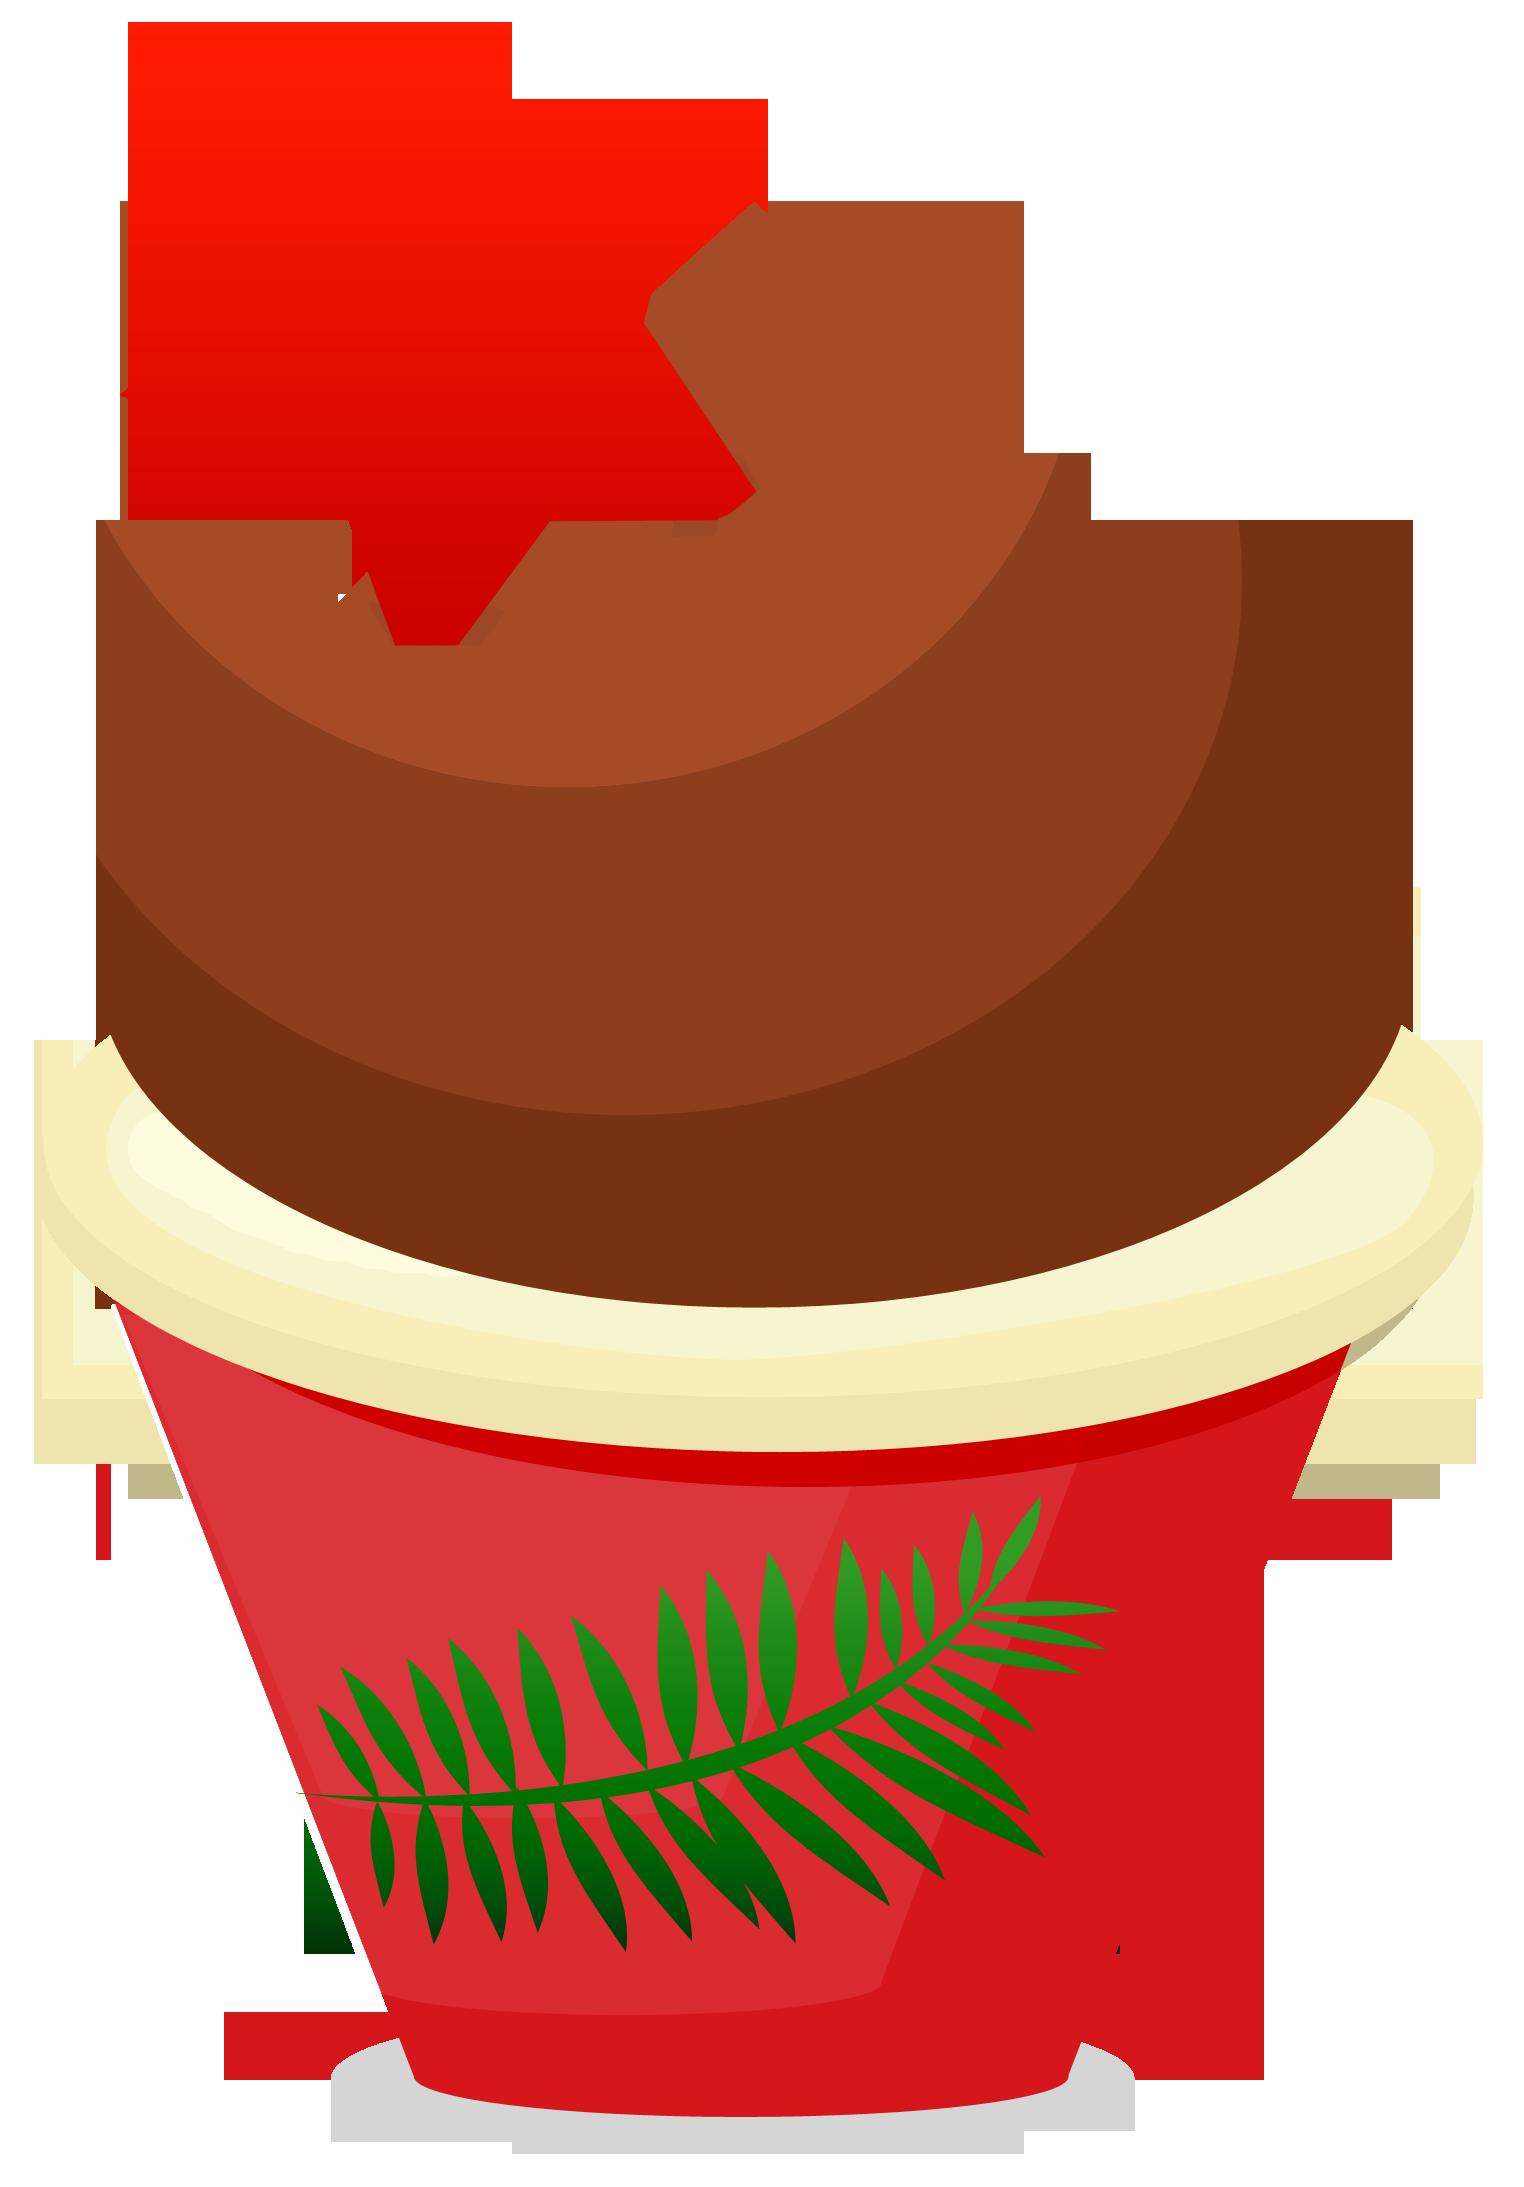 Christmas treats clipart clipart transparent Christmas Cupcake Clipart - Clipart Kid clipart transparent